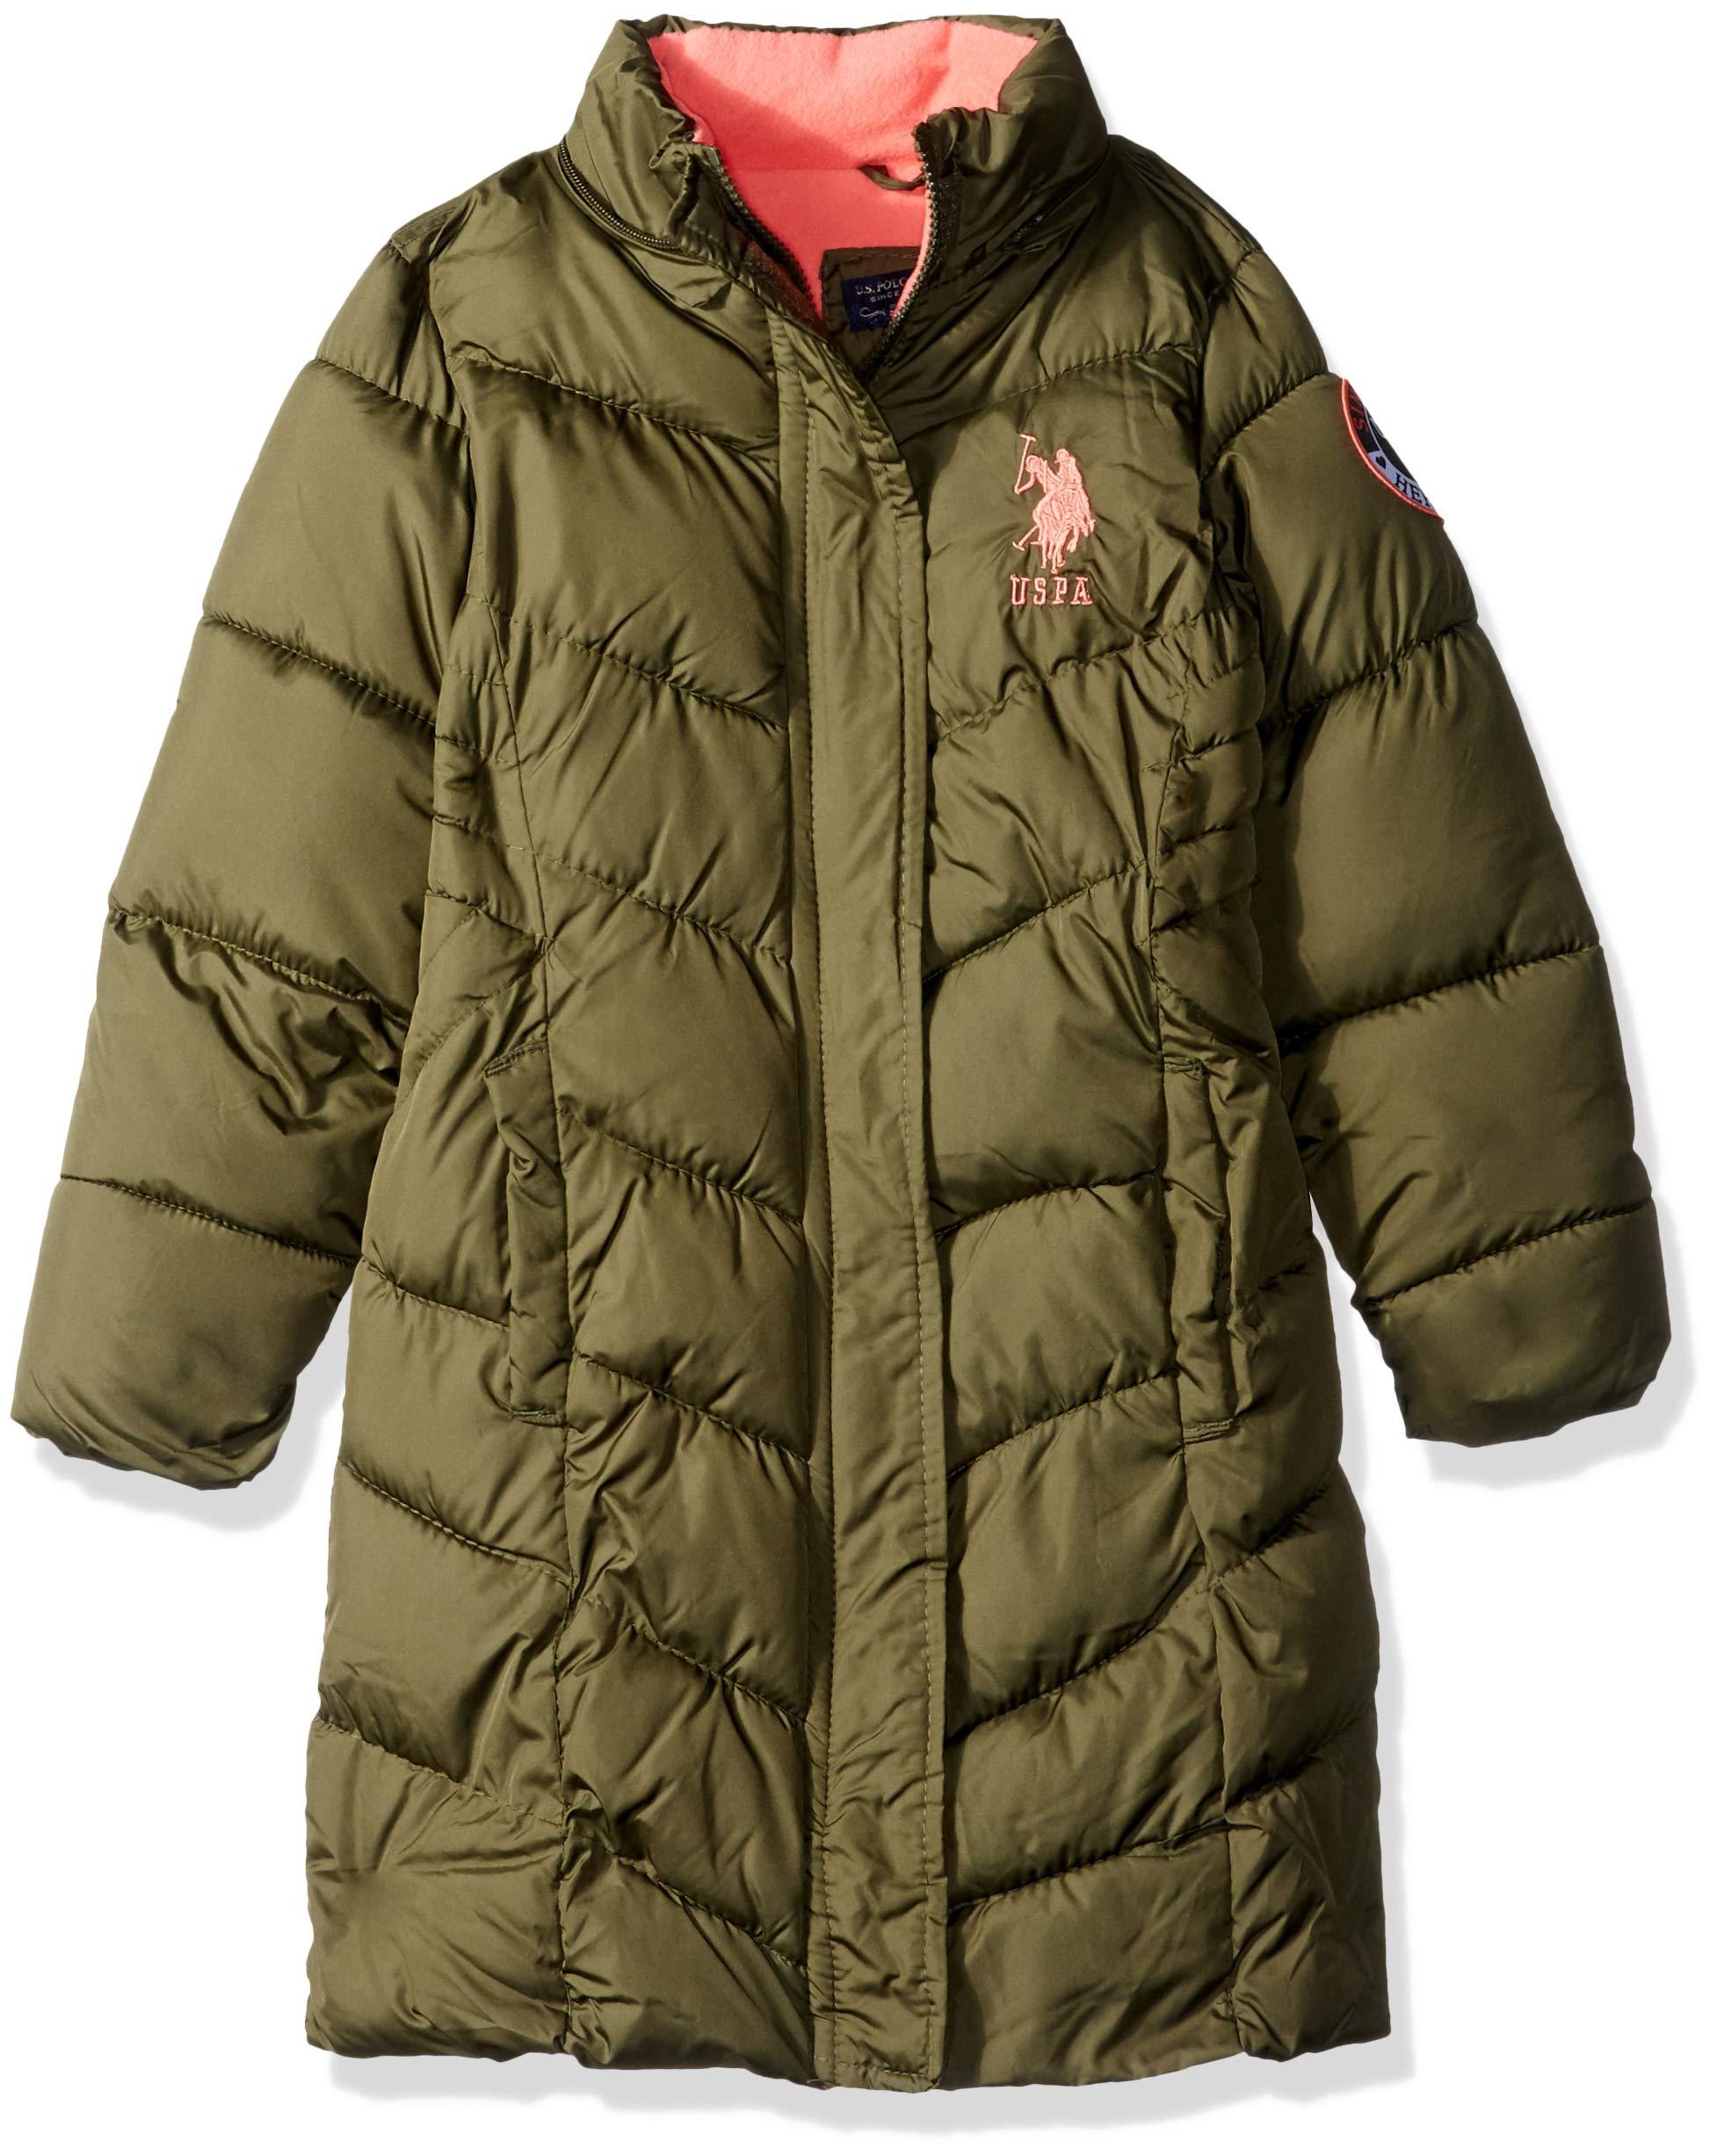 US Polo Association Girls' Big Long Bubble Jacket, Olive, 10/12 by U.S. Polo Assn. (Image #3)